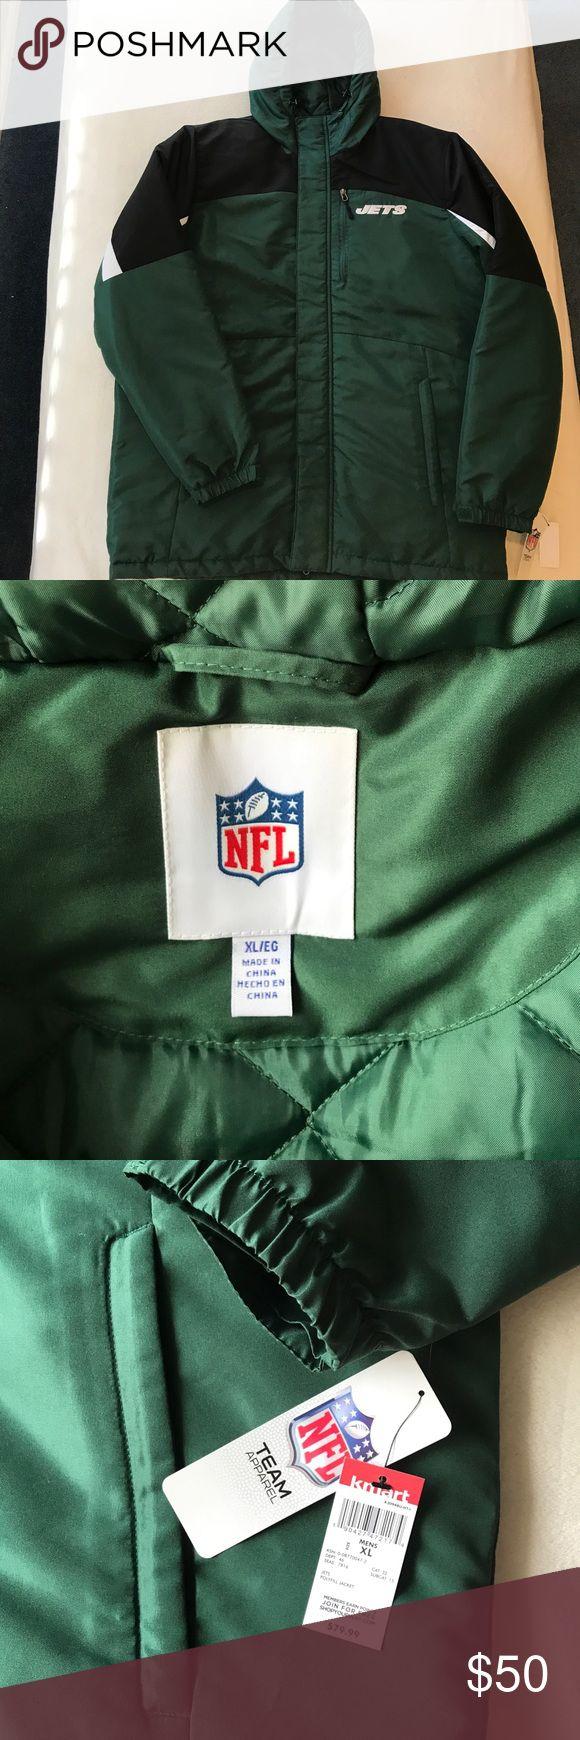 NFL JETS JACKET NWT NFL Jets Jacket. Make an offer! NFL Jackets & Coats Performance Jackets